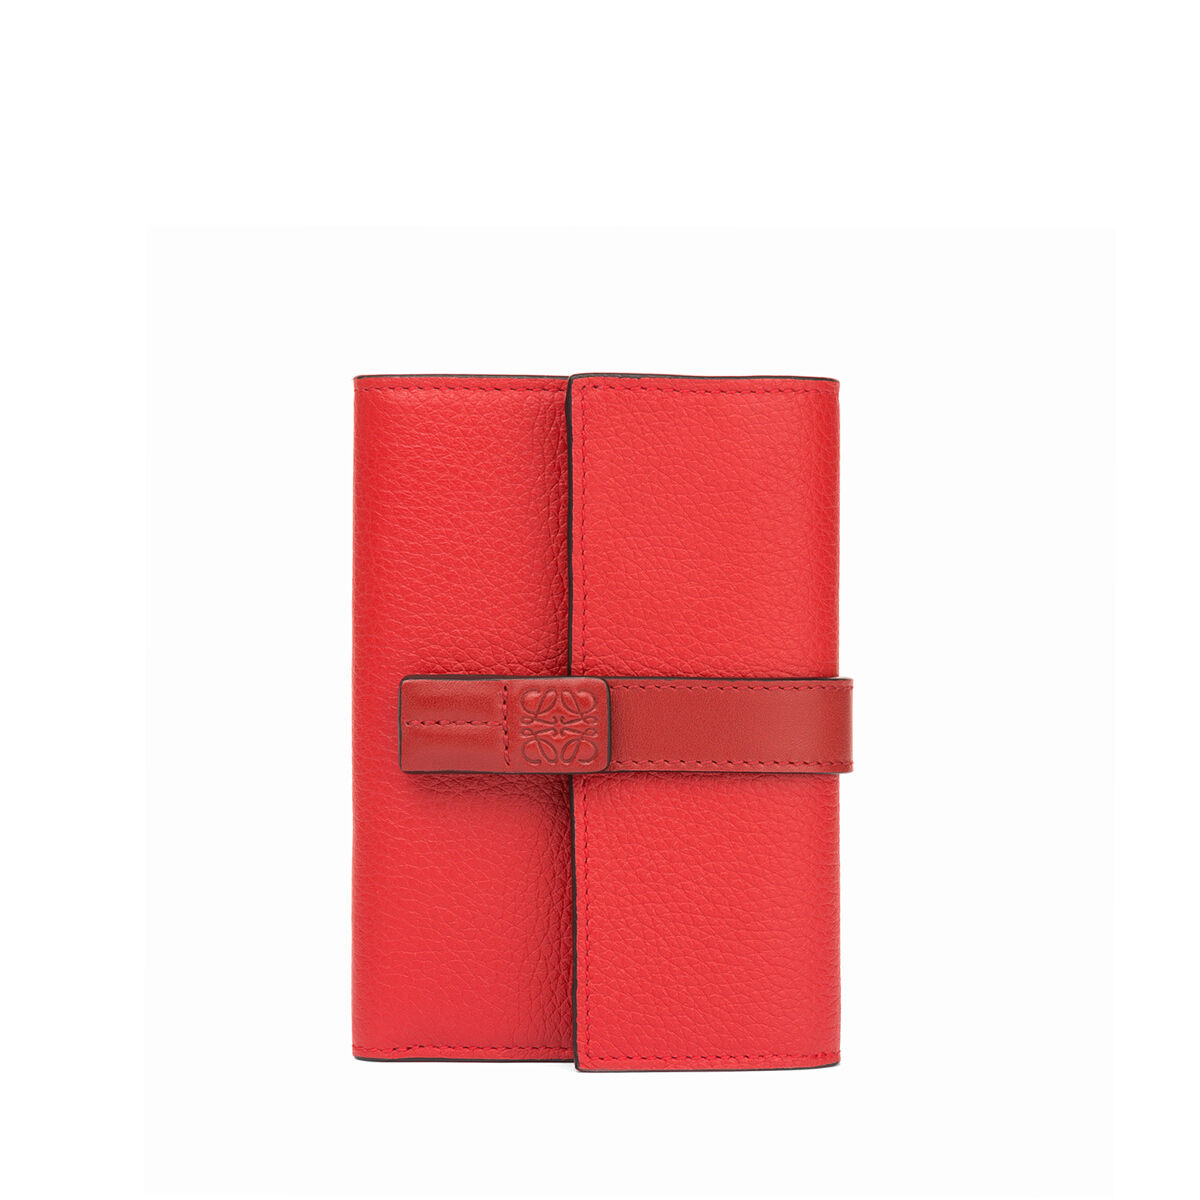 LOEWE Small Vertical Wallet Scarlet Red/Brick Red all